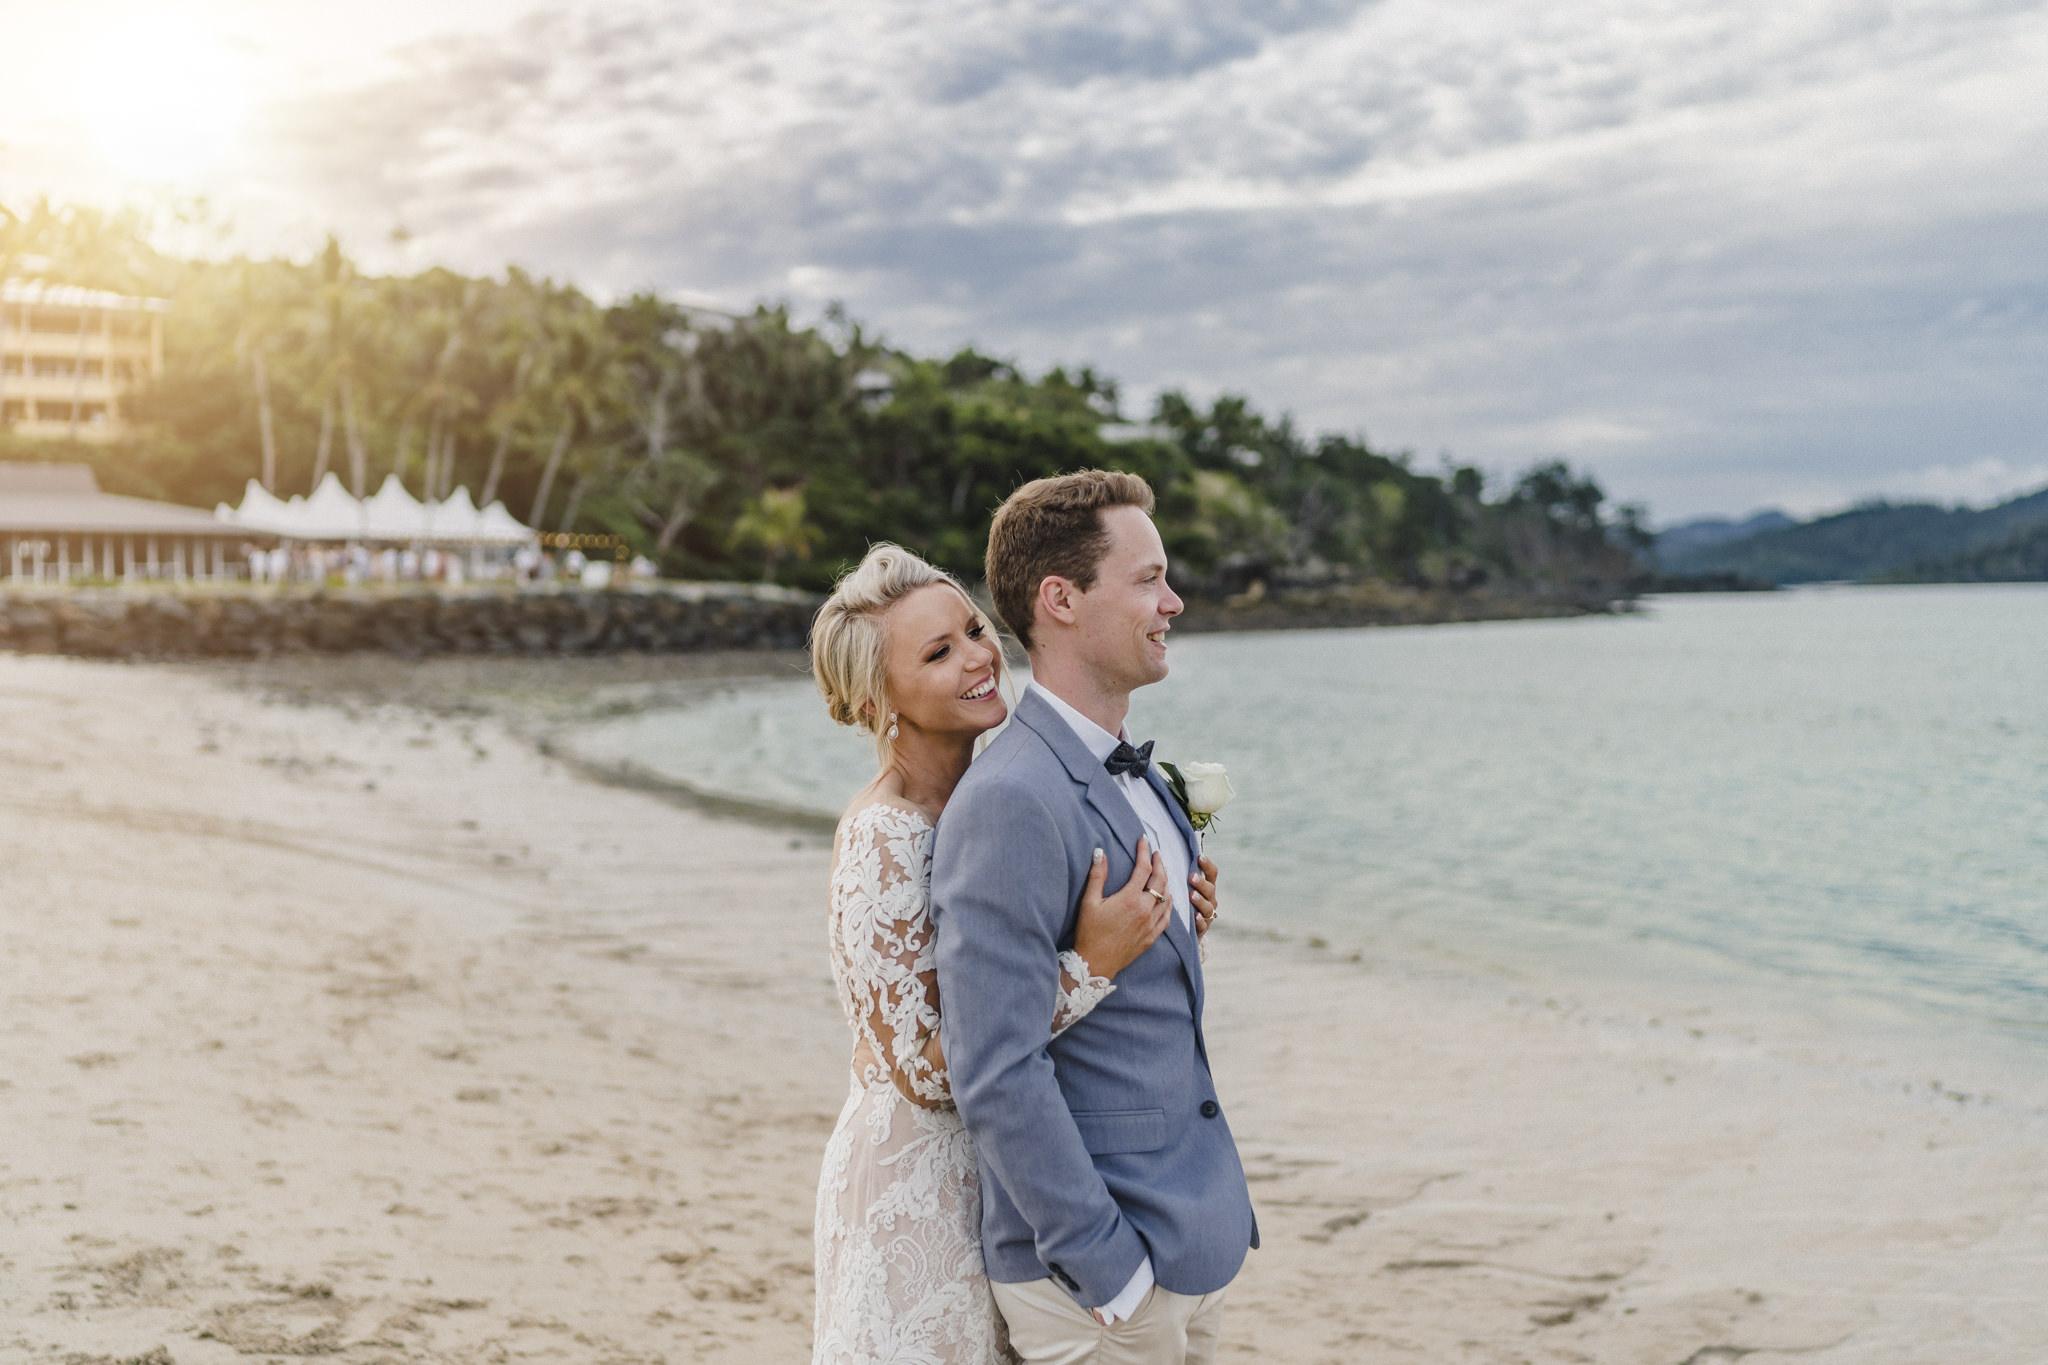 Corey Wright Hamilton Island Wedding Photography_001